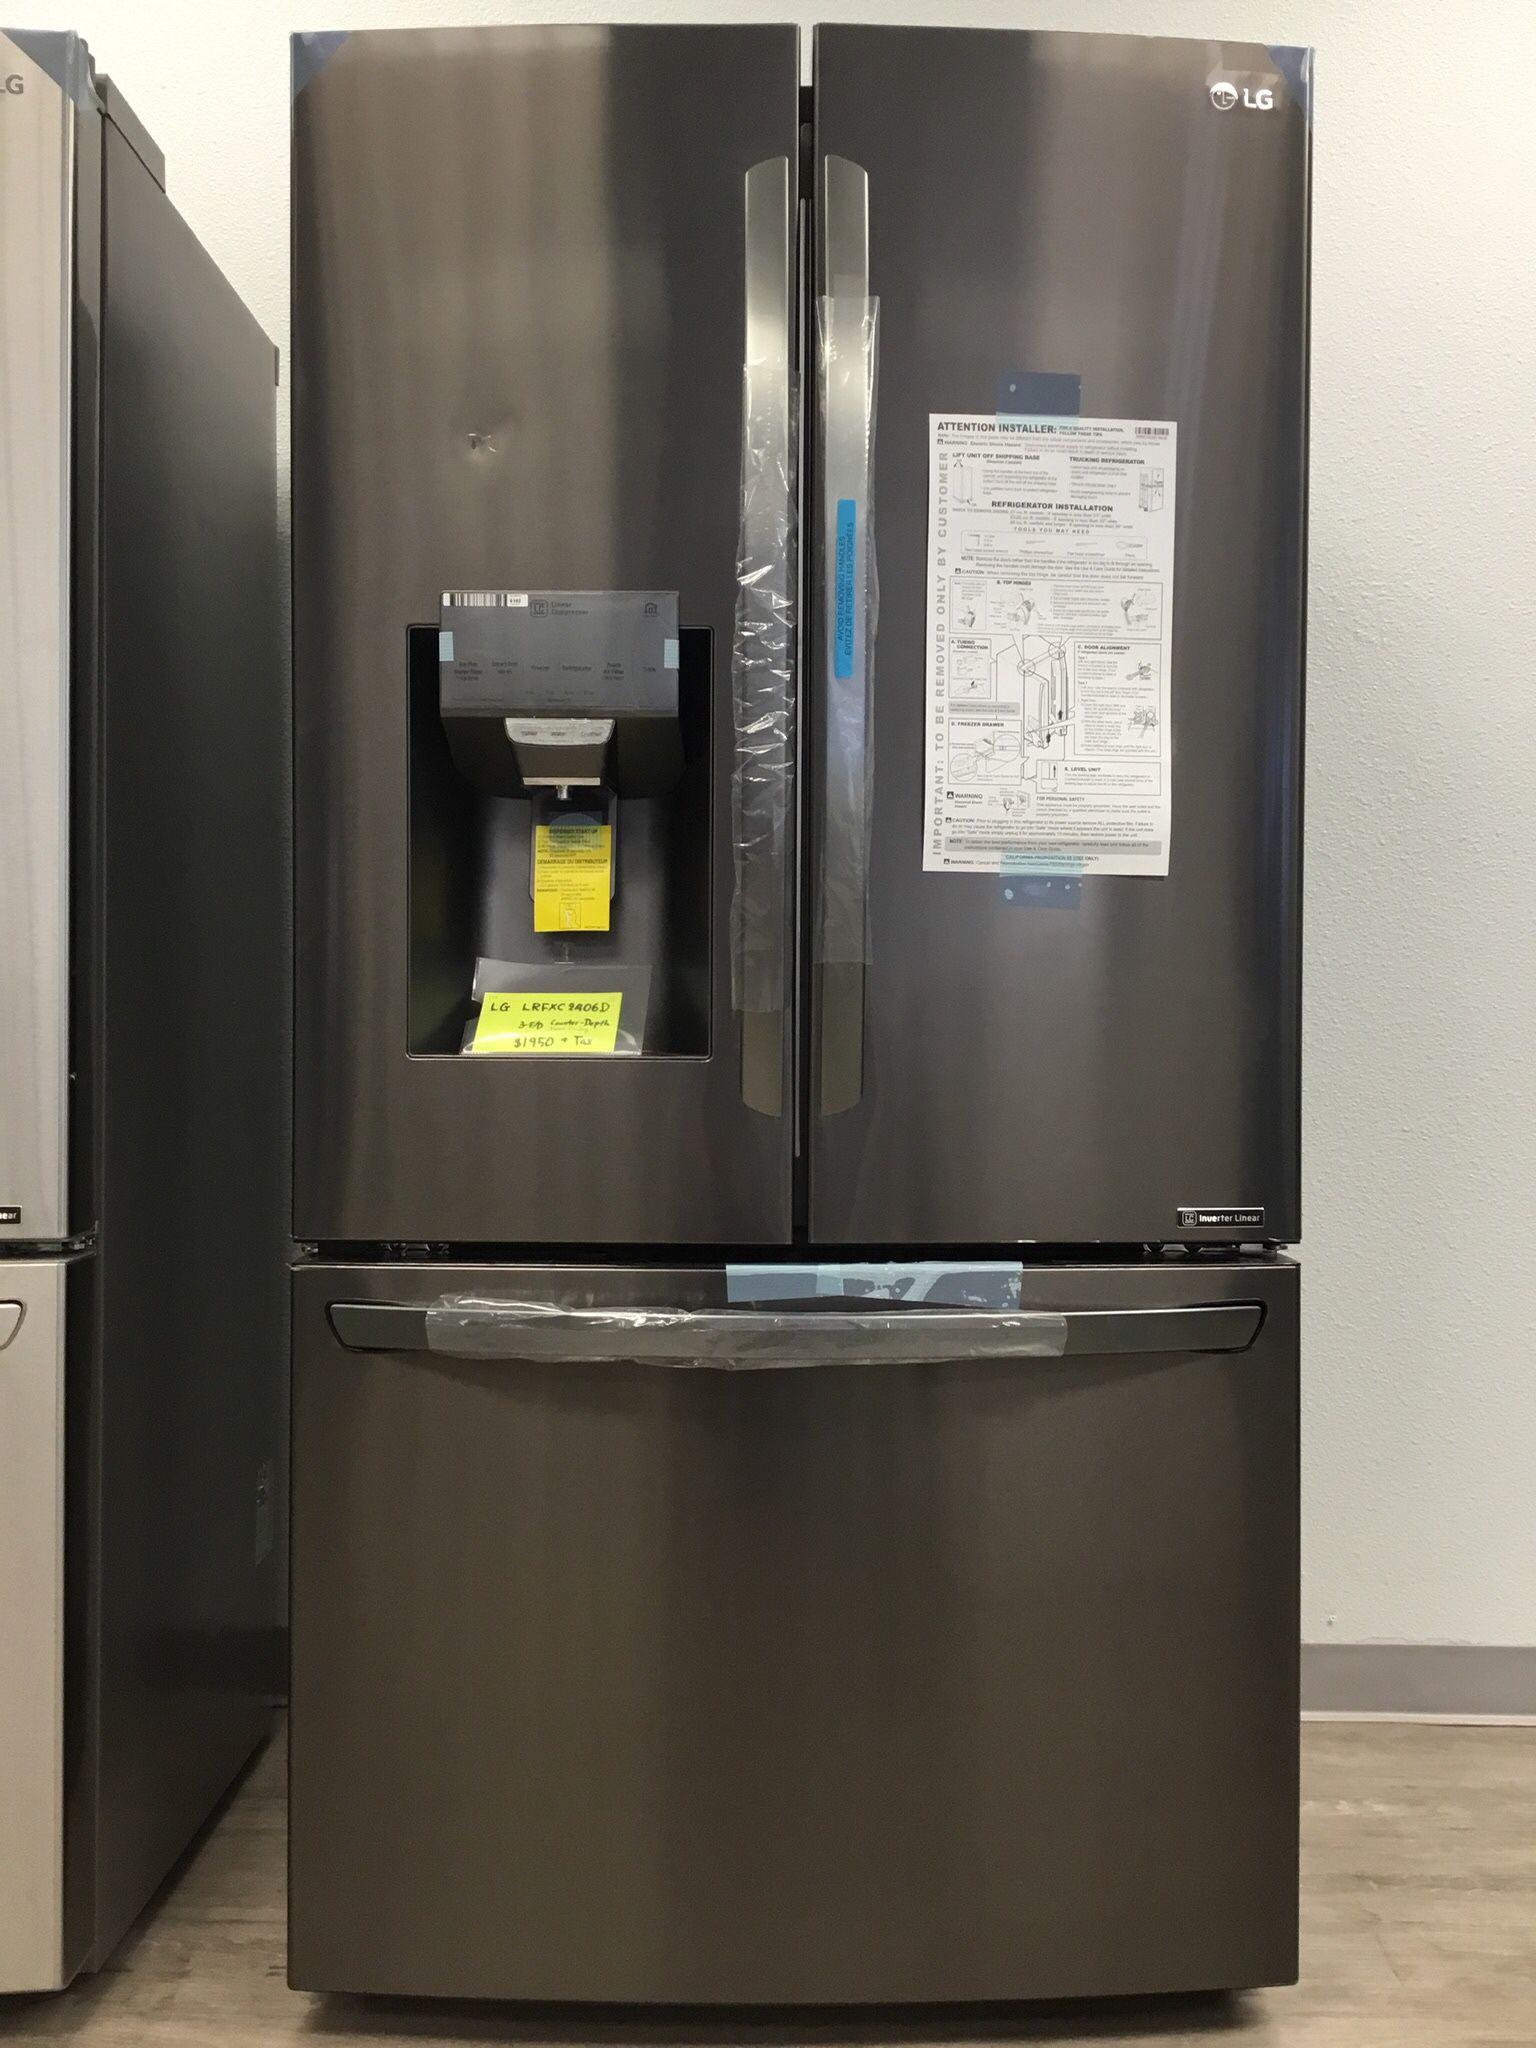 LG COUNTER-DEPTH / CRAFT ICE / Metal Interior / SMART HOME & WI-FI #2150